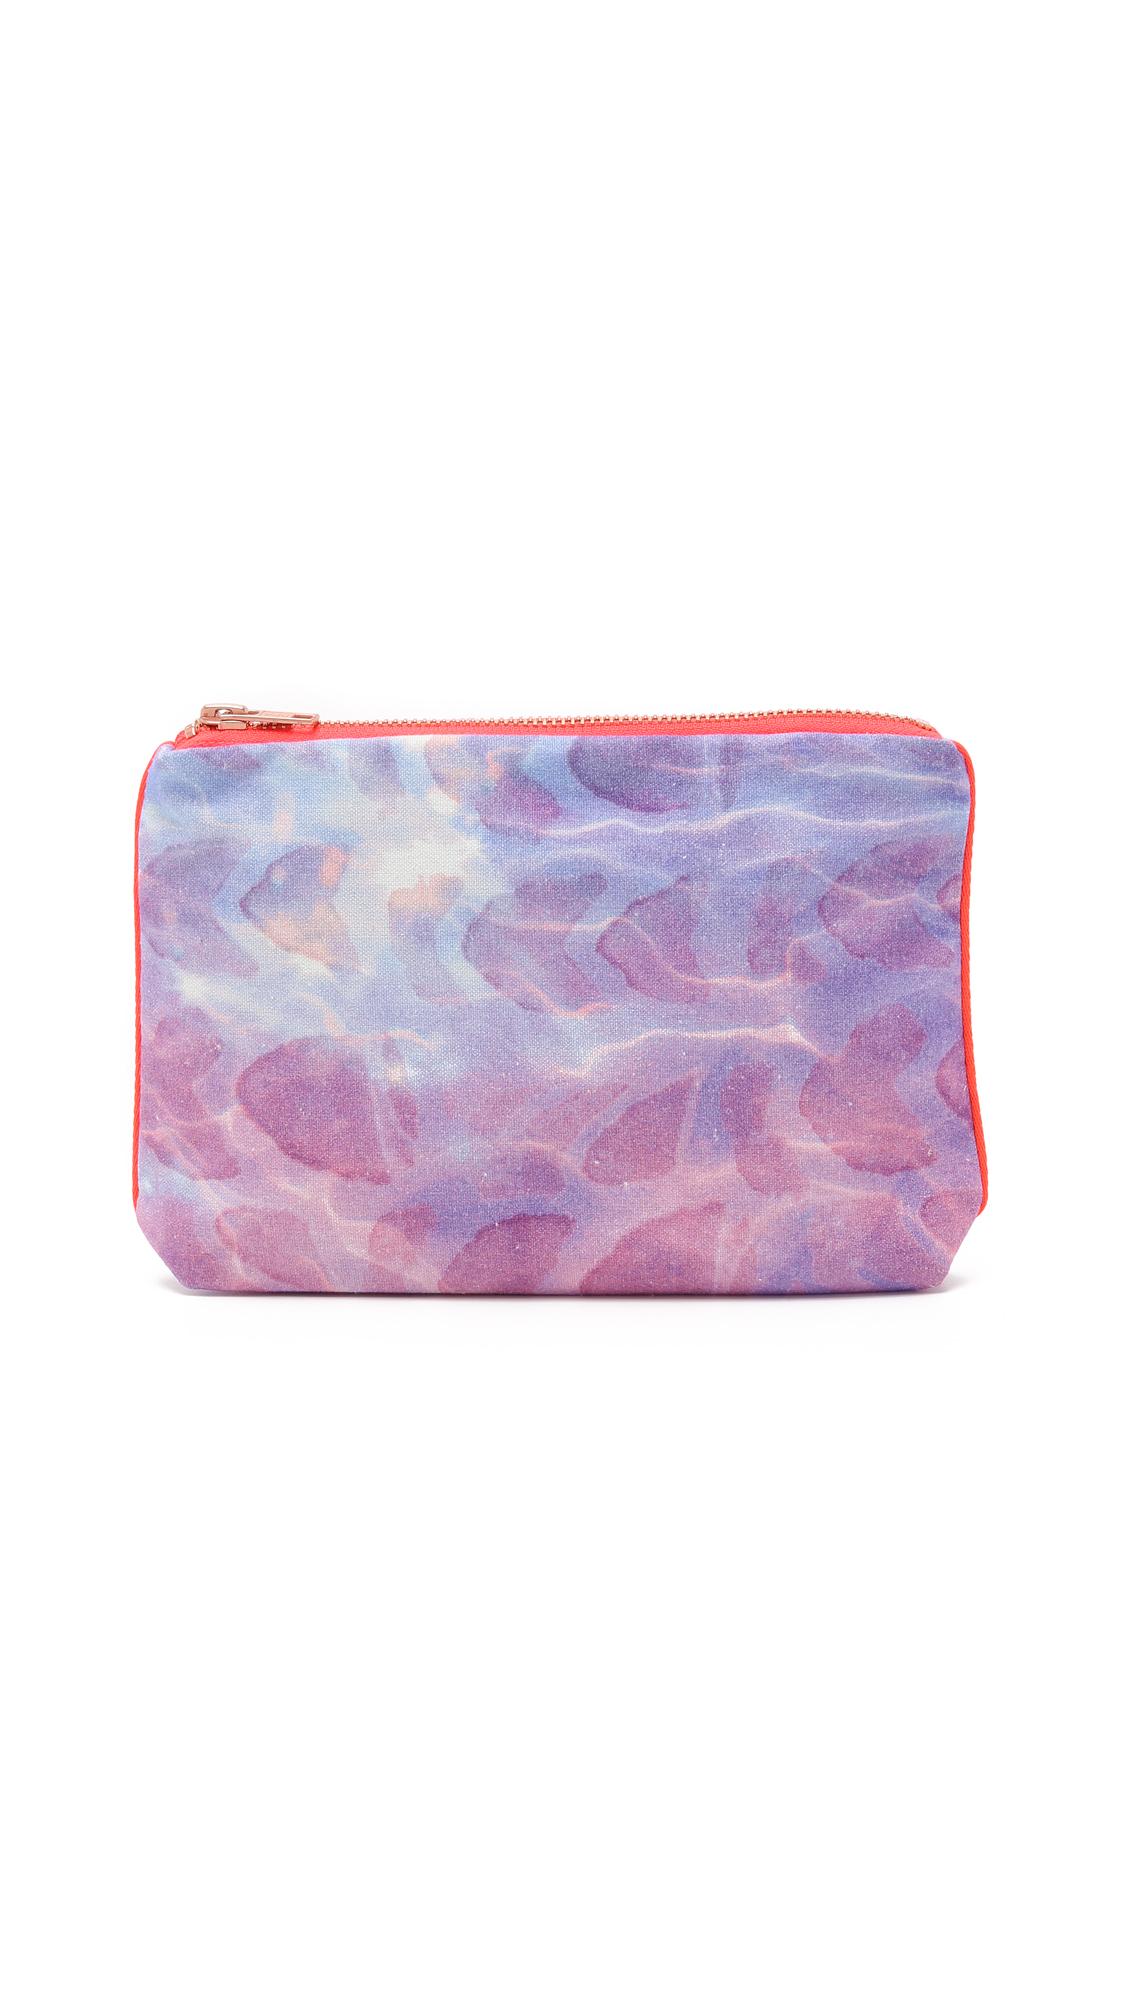 samudra female samudra baby pouch purple shell